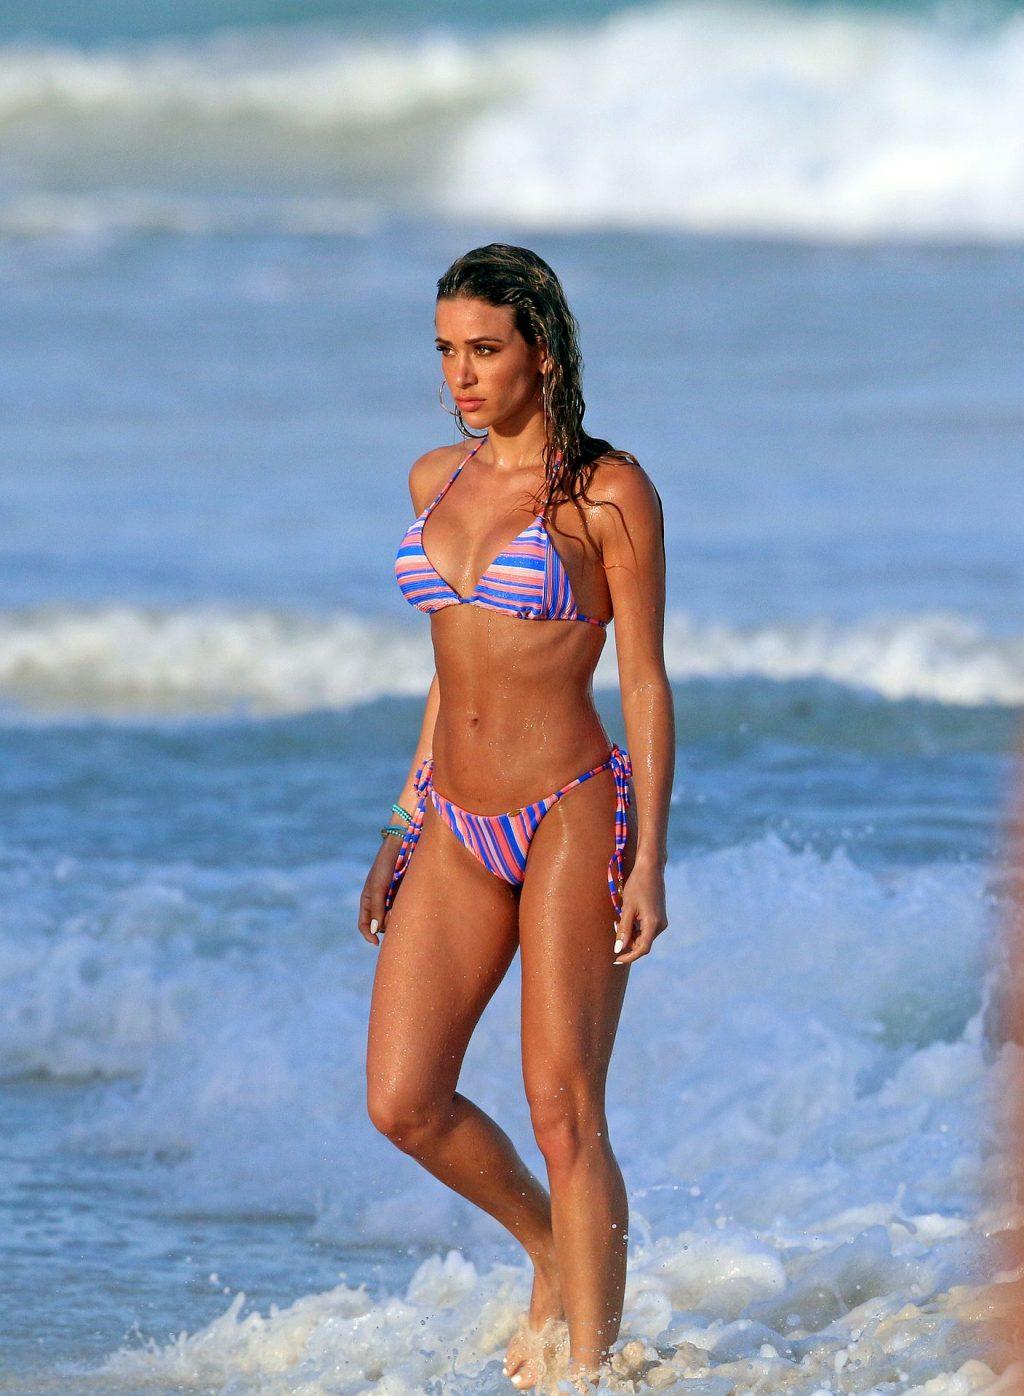 Cindy Prado Doing a Photoshoot in Cancun